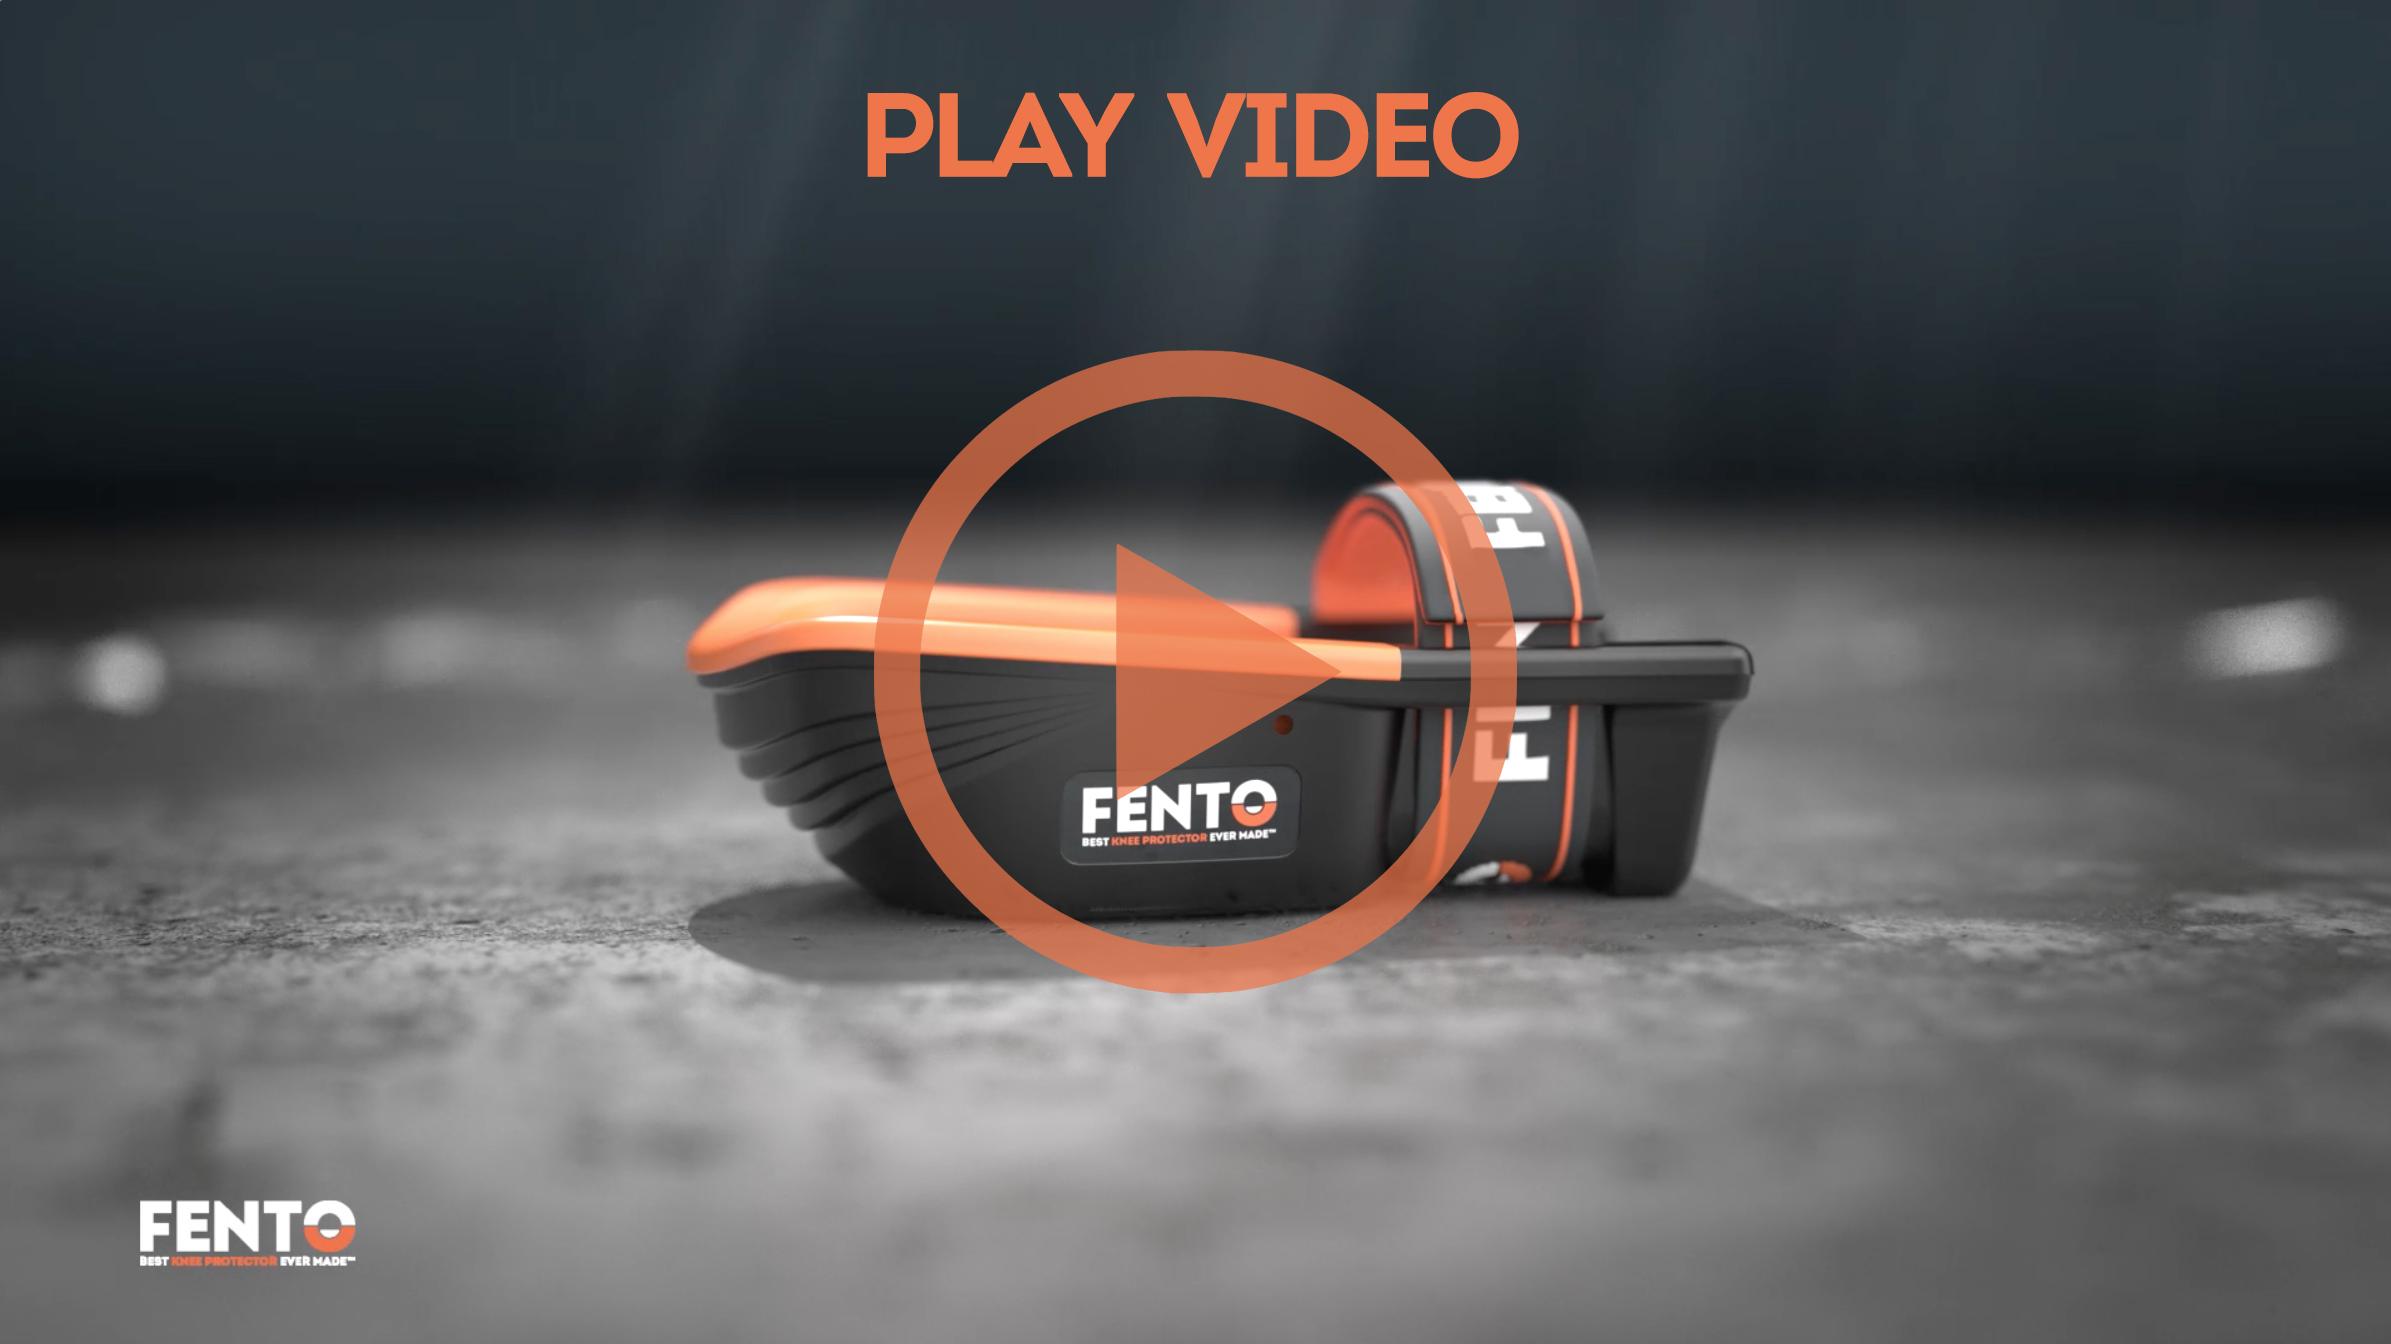 FENTO Video